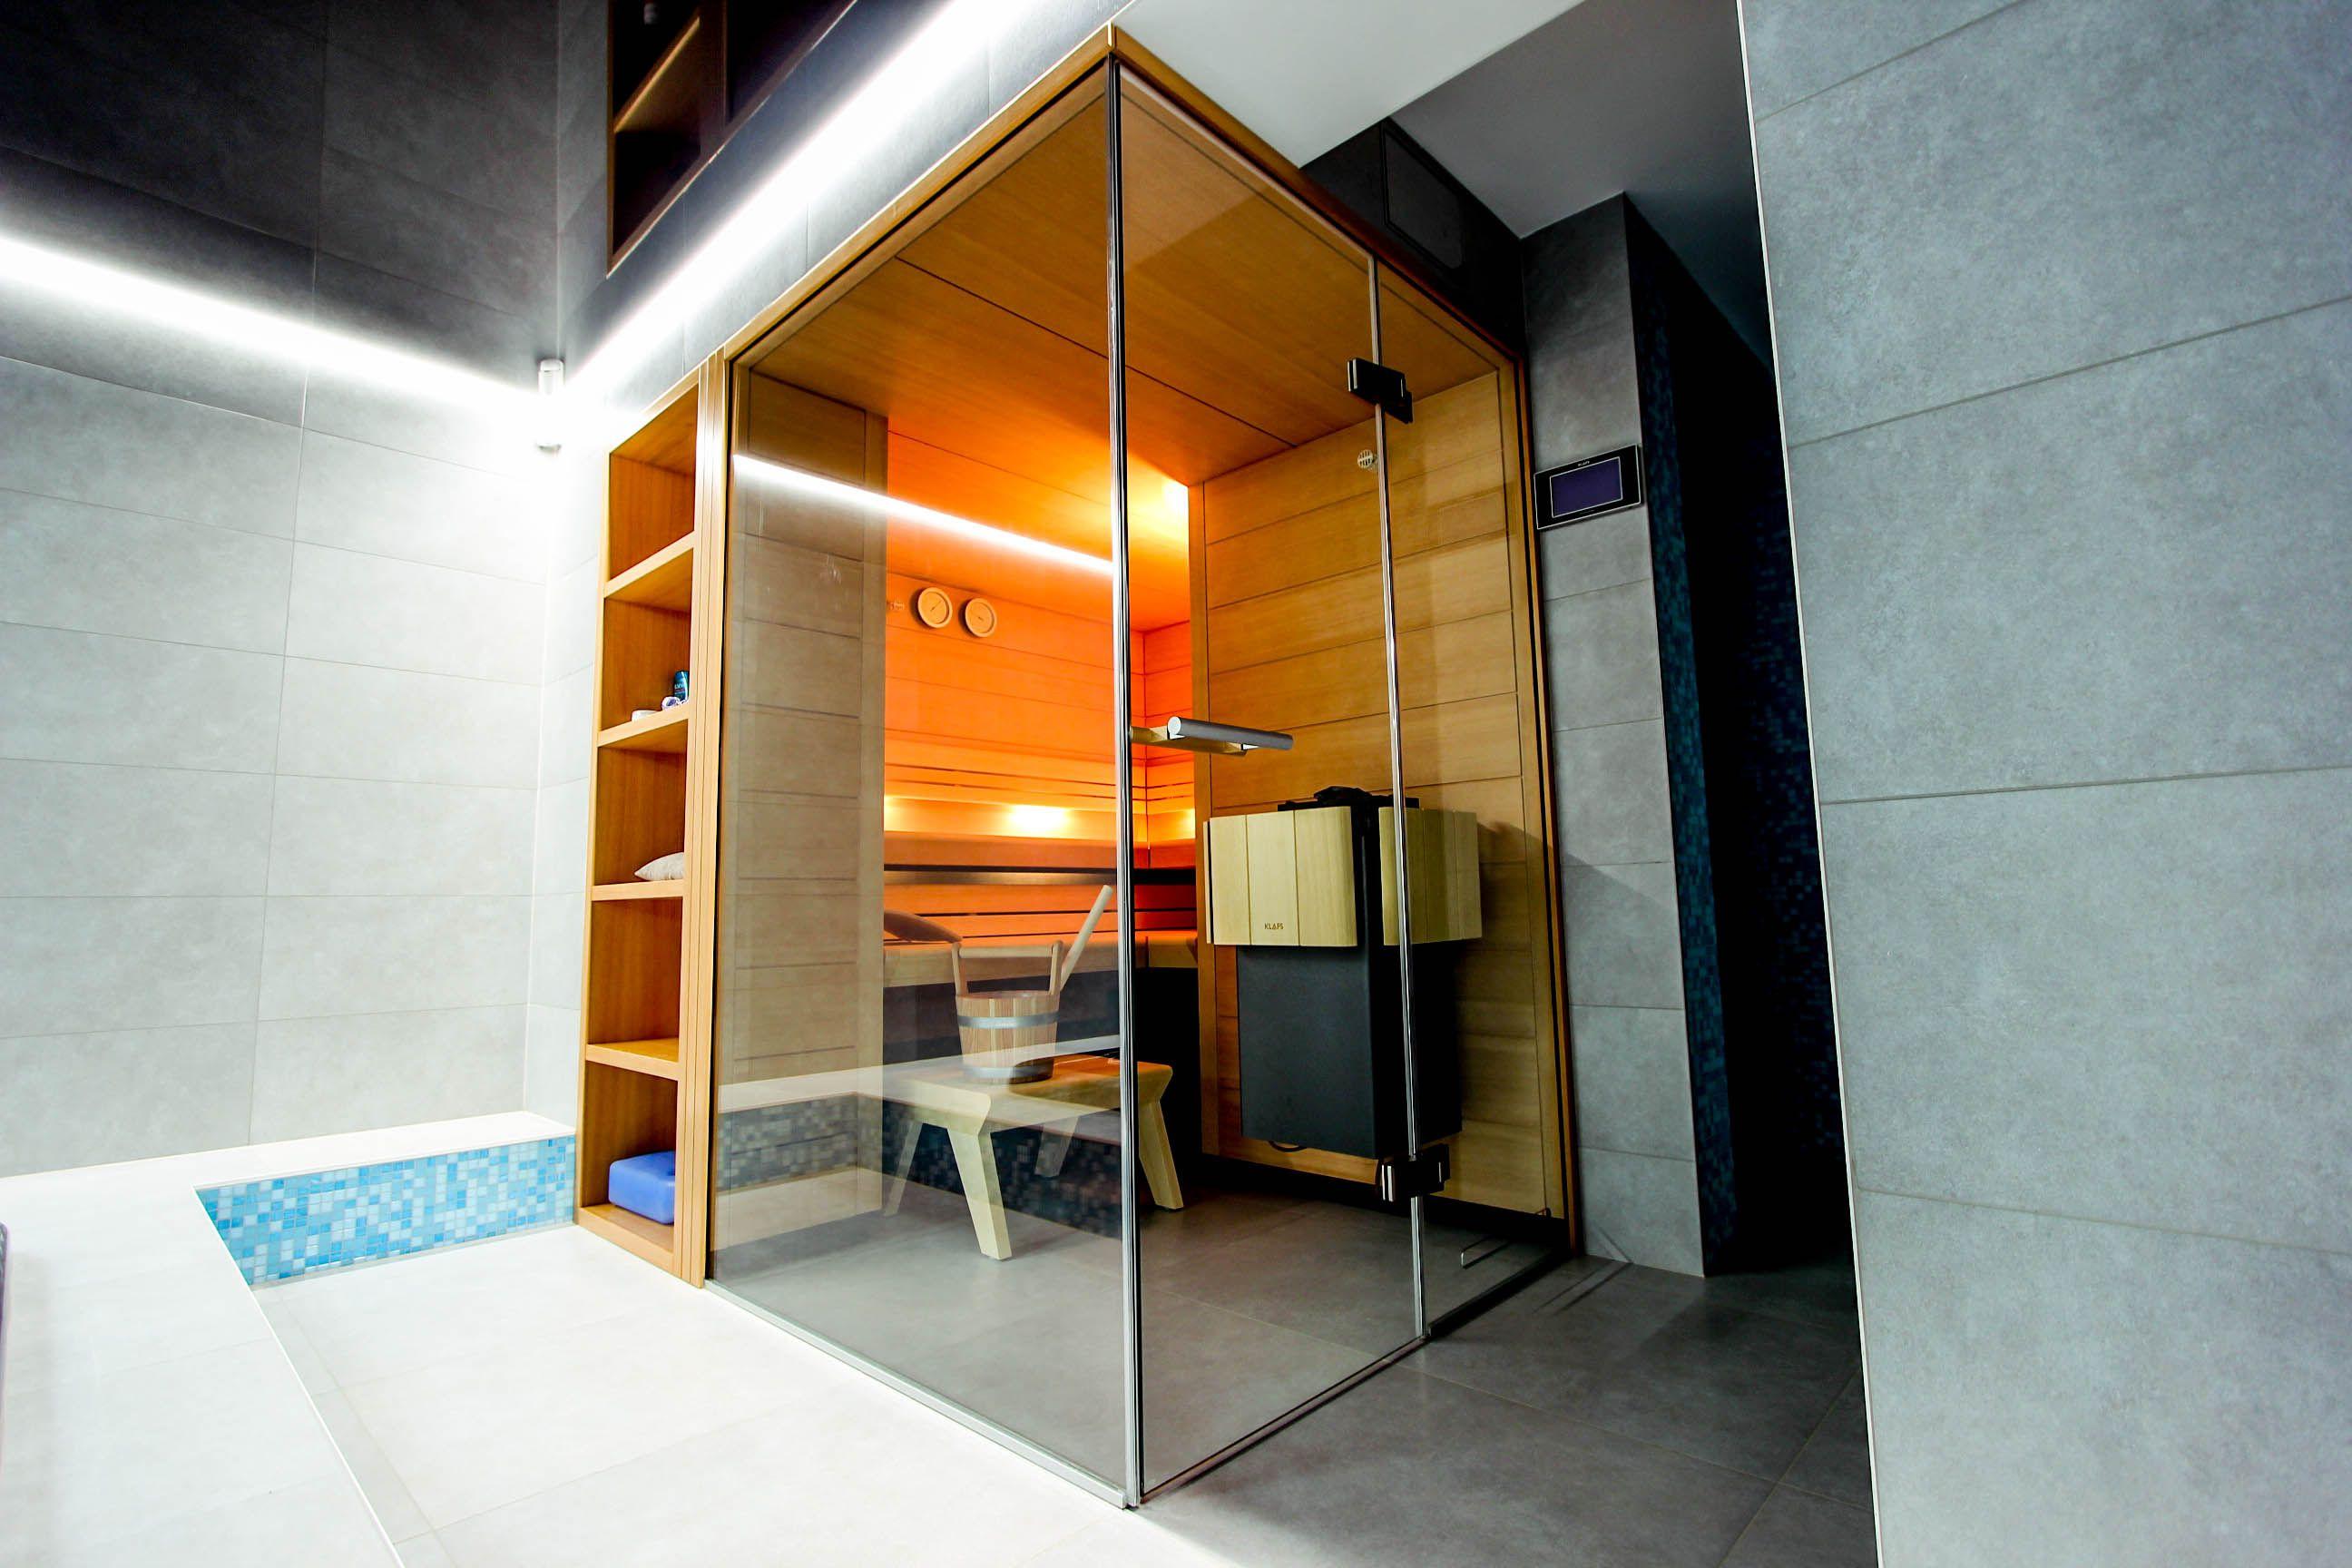 sauna klafs sauny klafs pinterest saunas. Black Bedroom Furniture Sets. Home Design Ideas